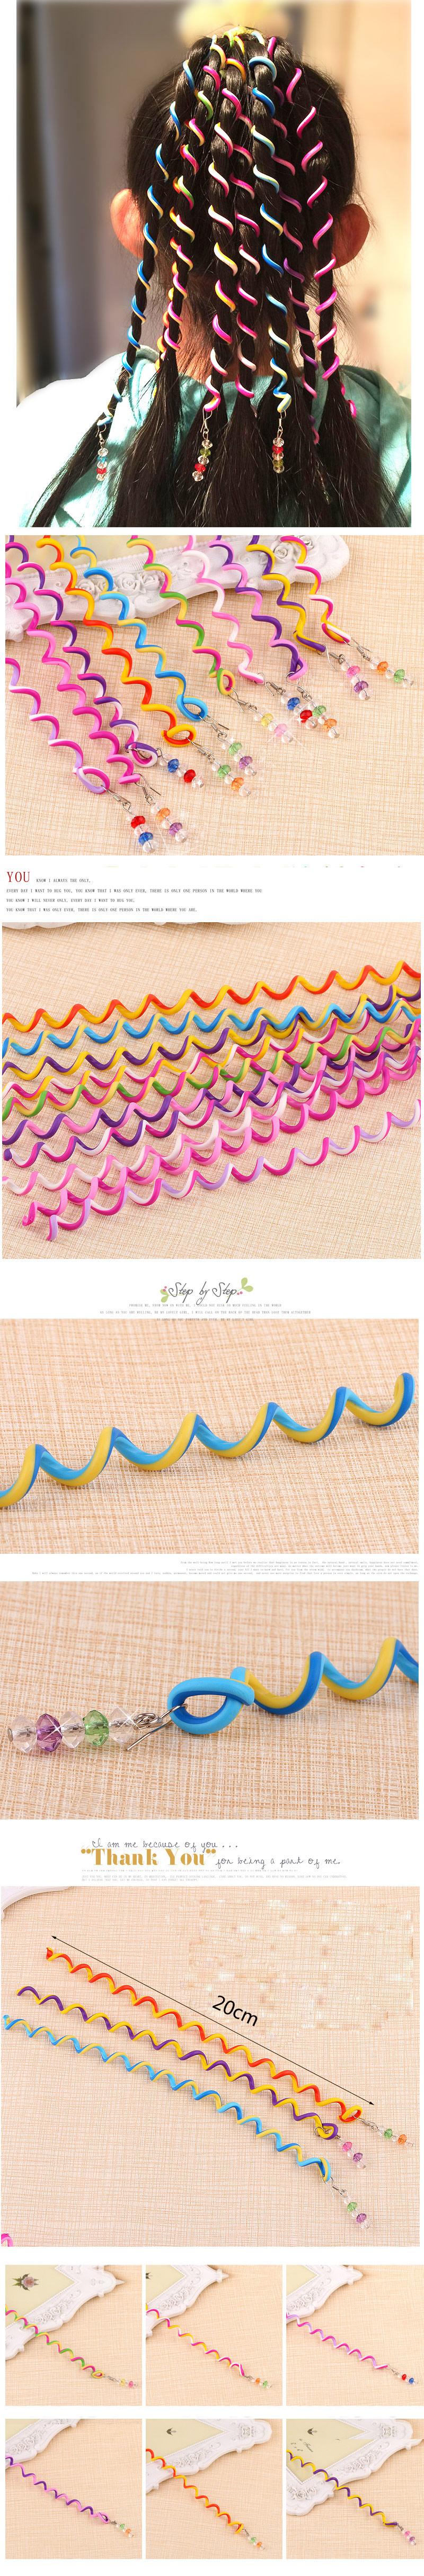 Candy-colored Princess Korean Spiral Hair Weaving Device Rainbow Hair Accessories Headdress Beaded Curly Hair Stick NHSC201770